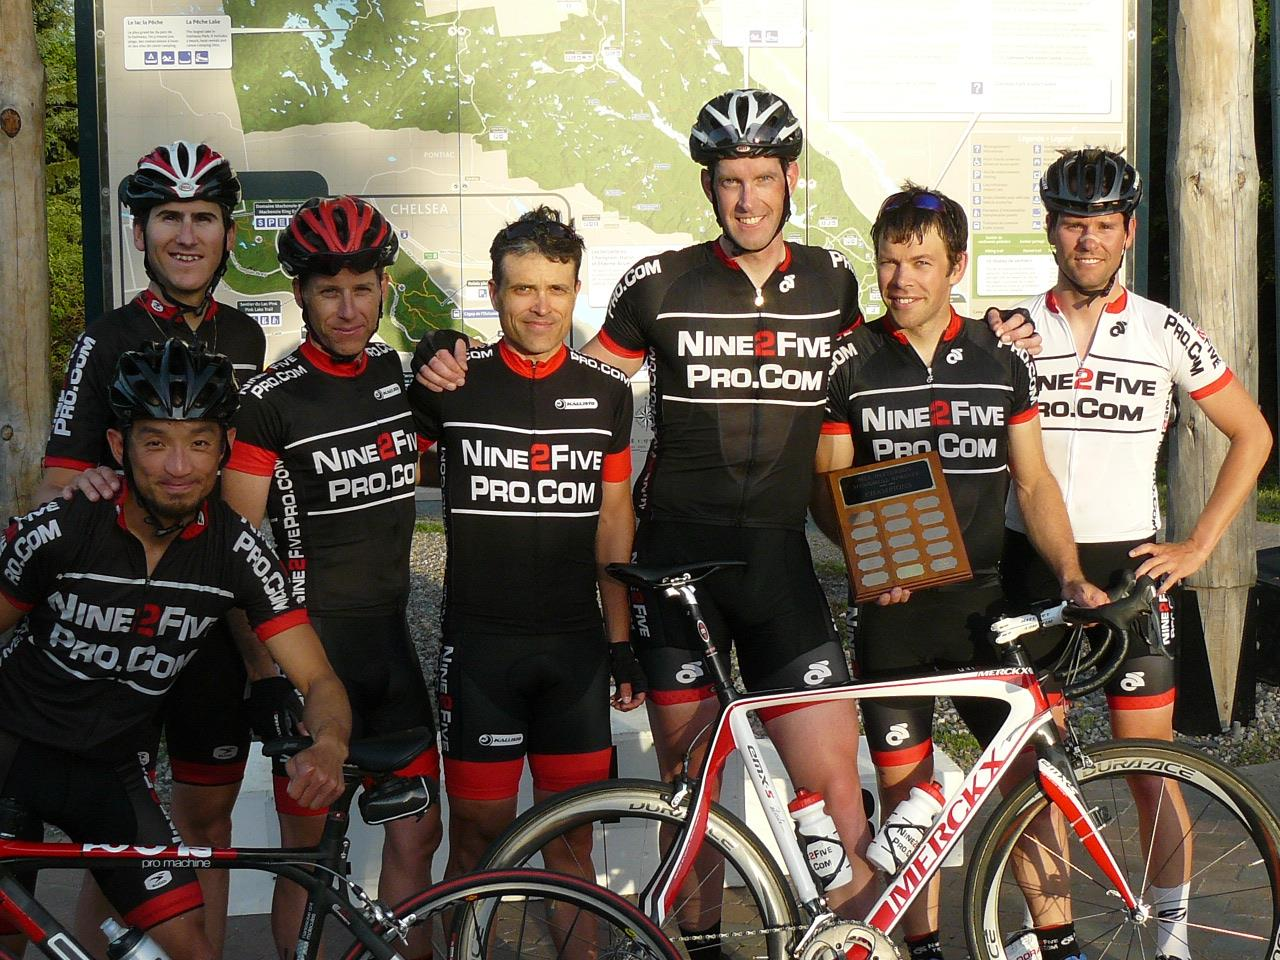 Group photo for winning team. Photo credit goes to Doug Corner from Bike Race Ottawa.